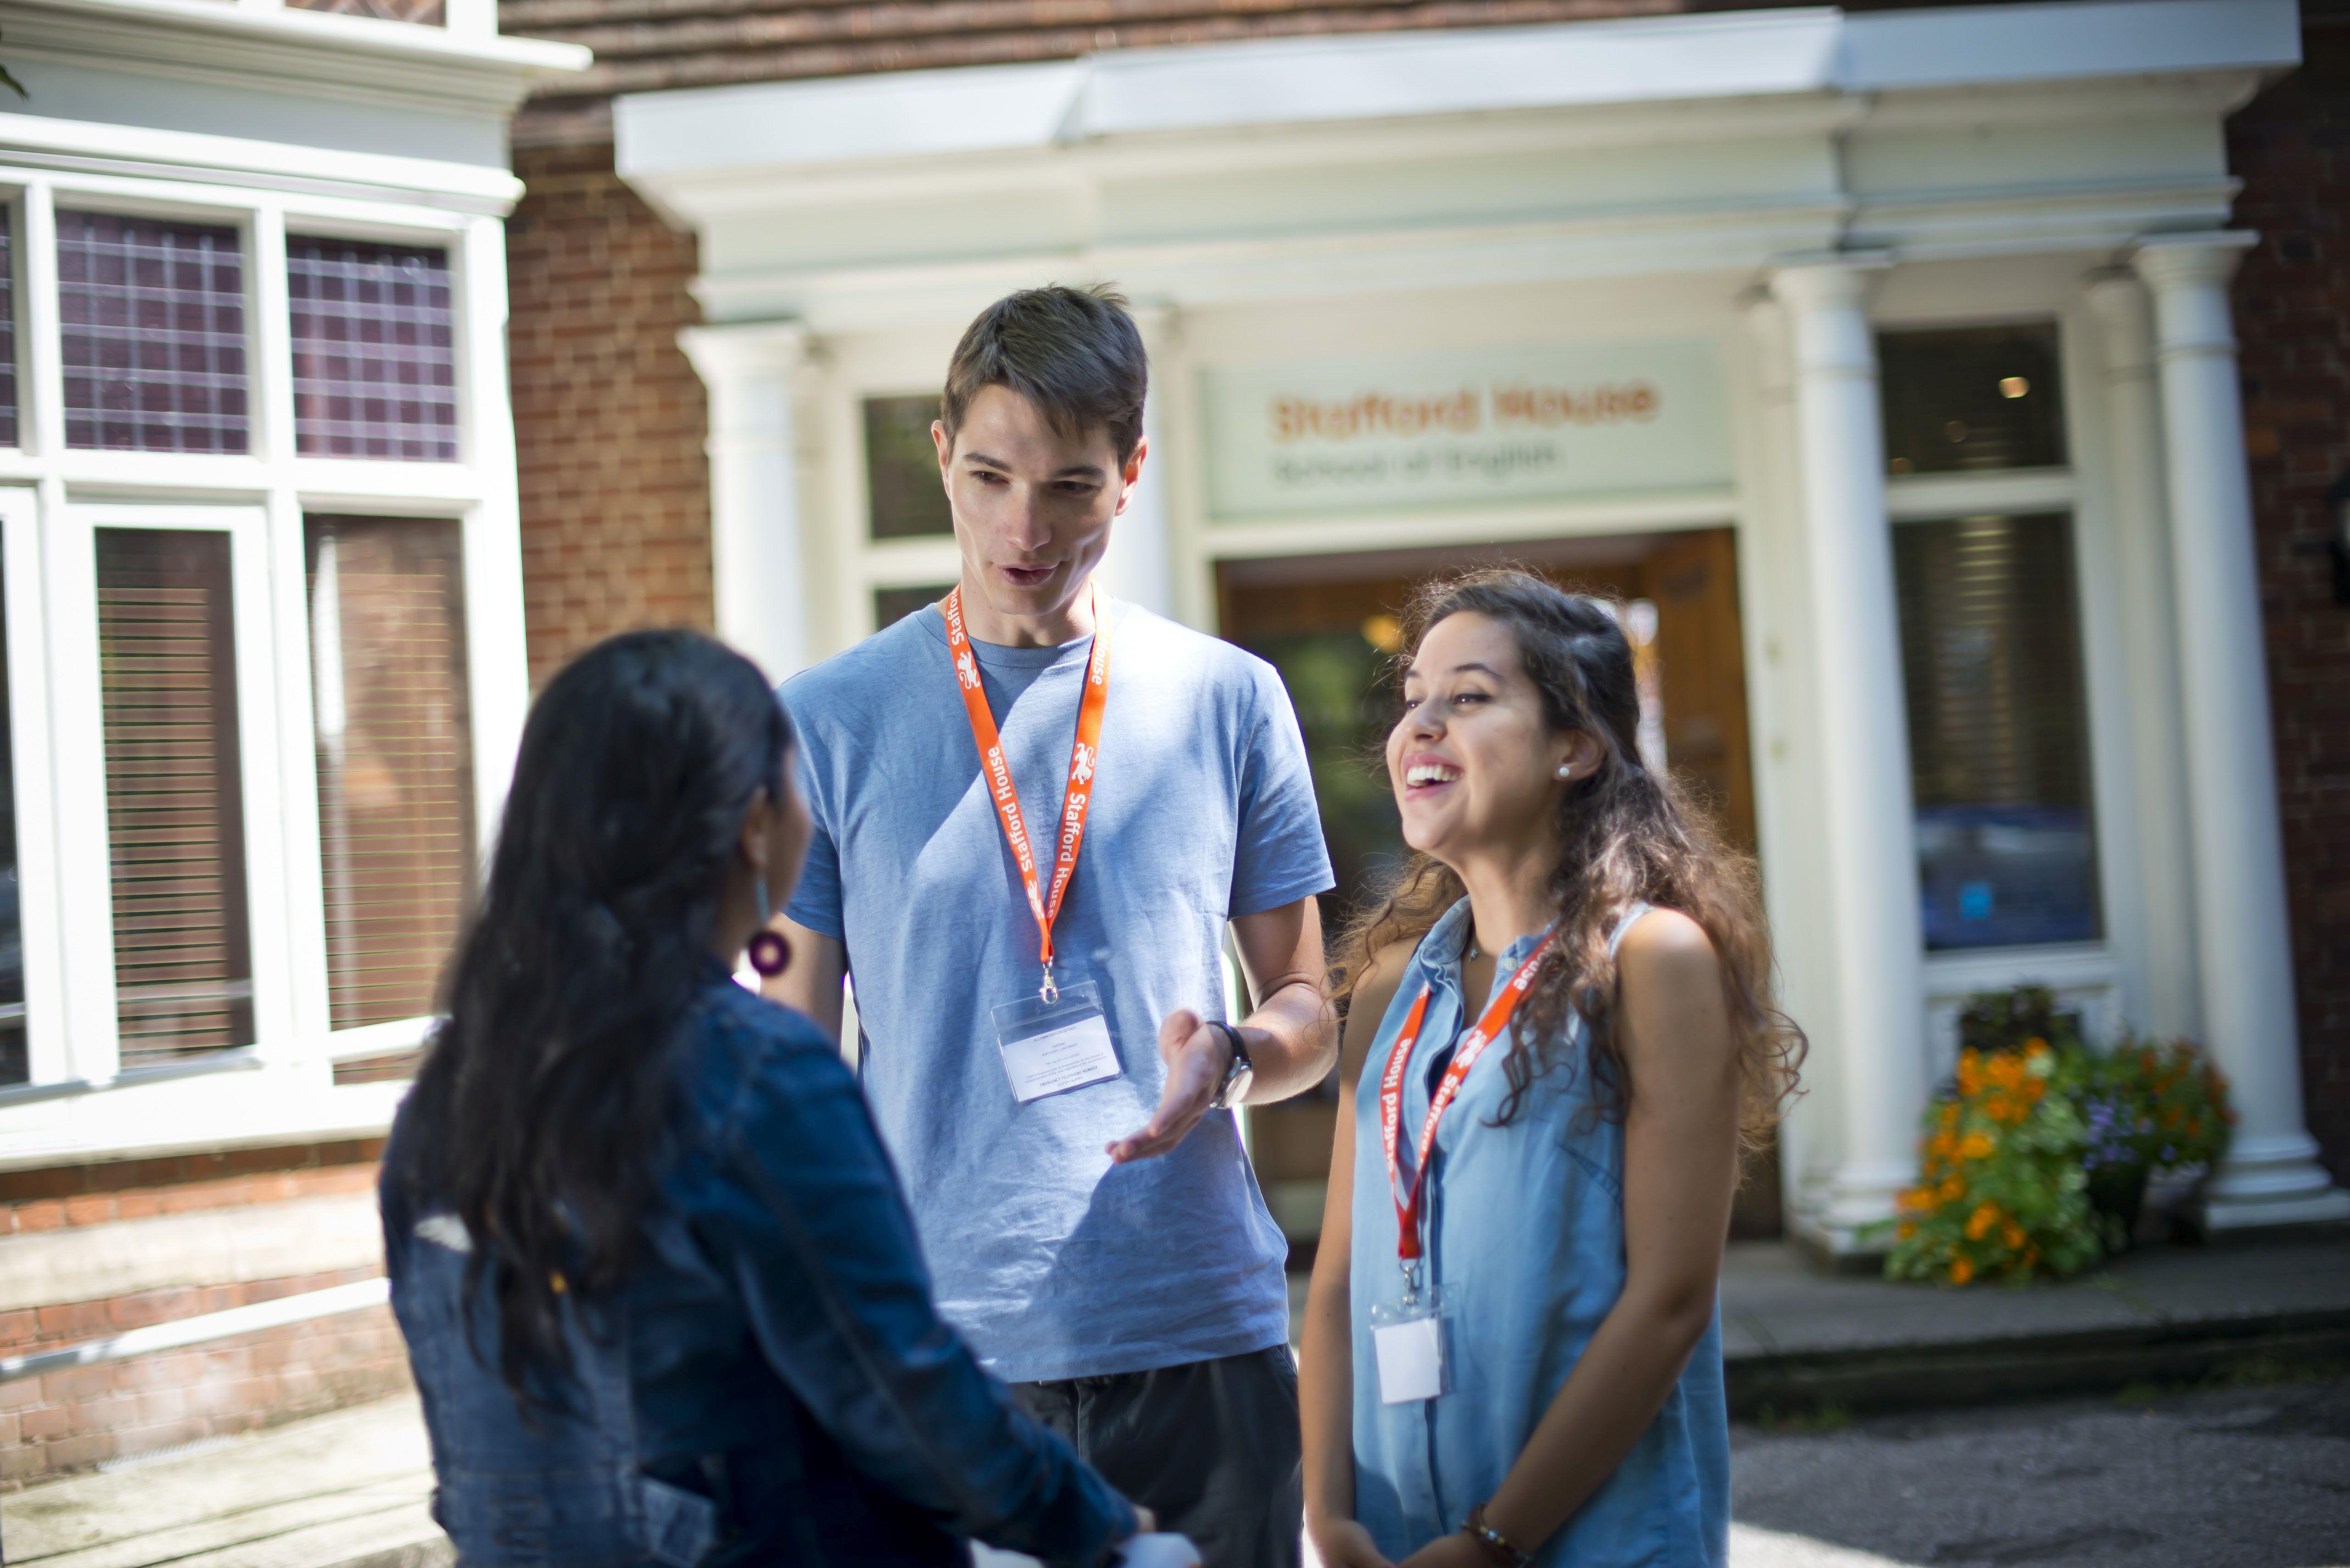 Stafford House School of English Canterbury campus